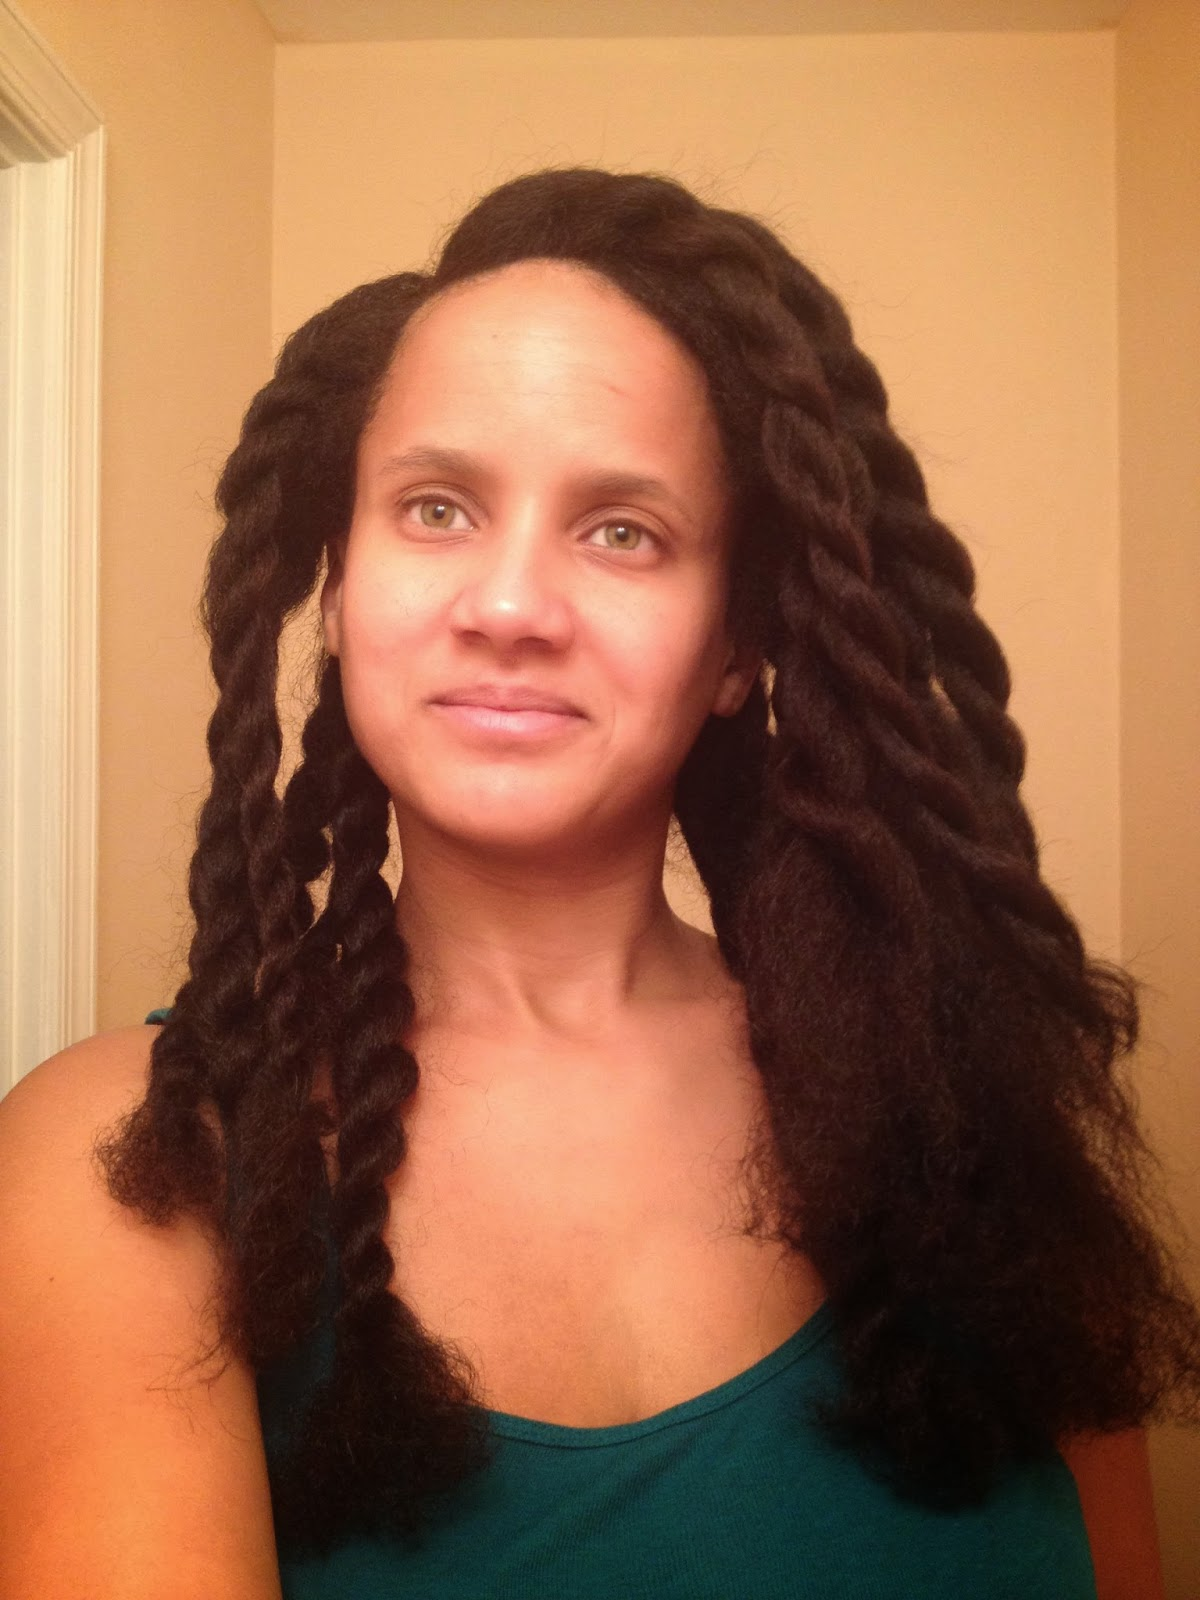 Trimming Natural Hair With Regular Scissors